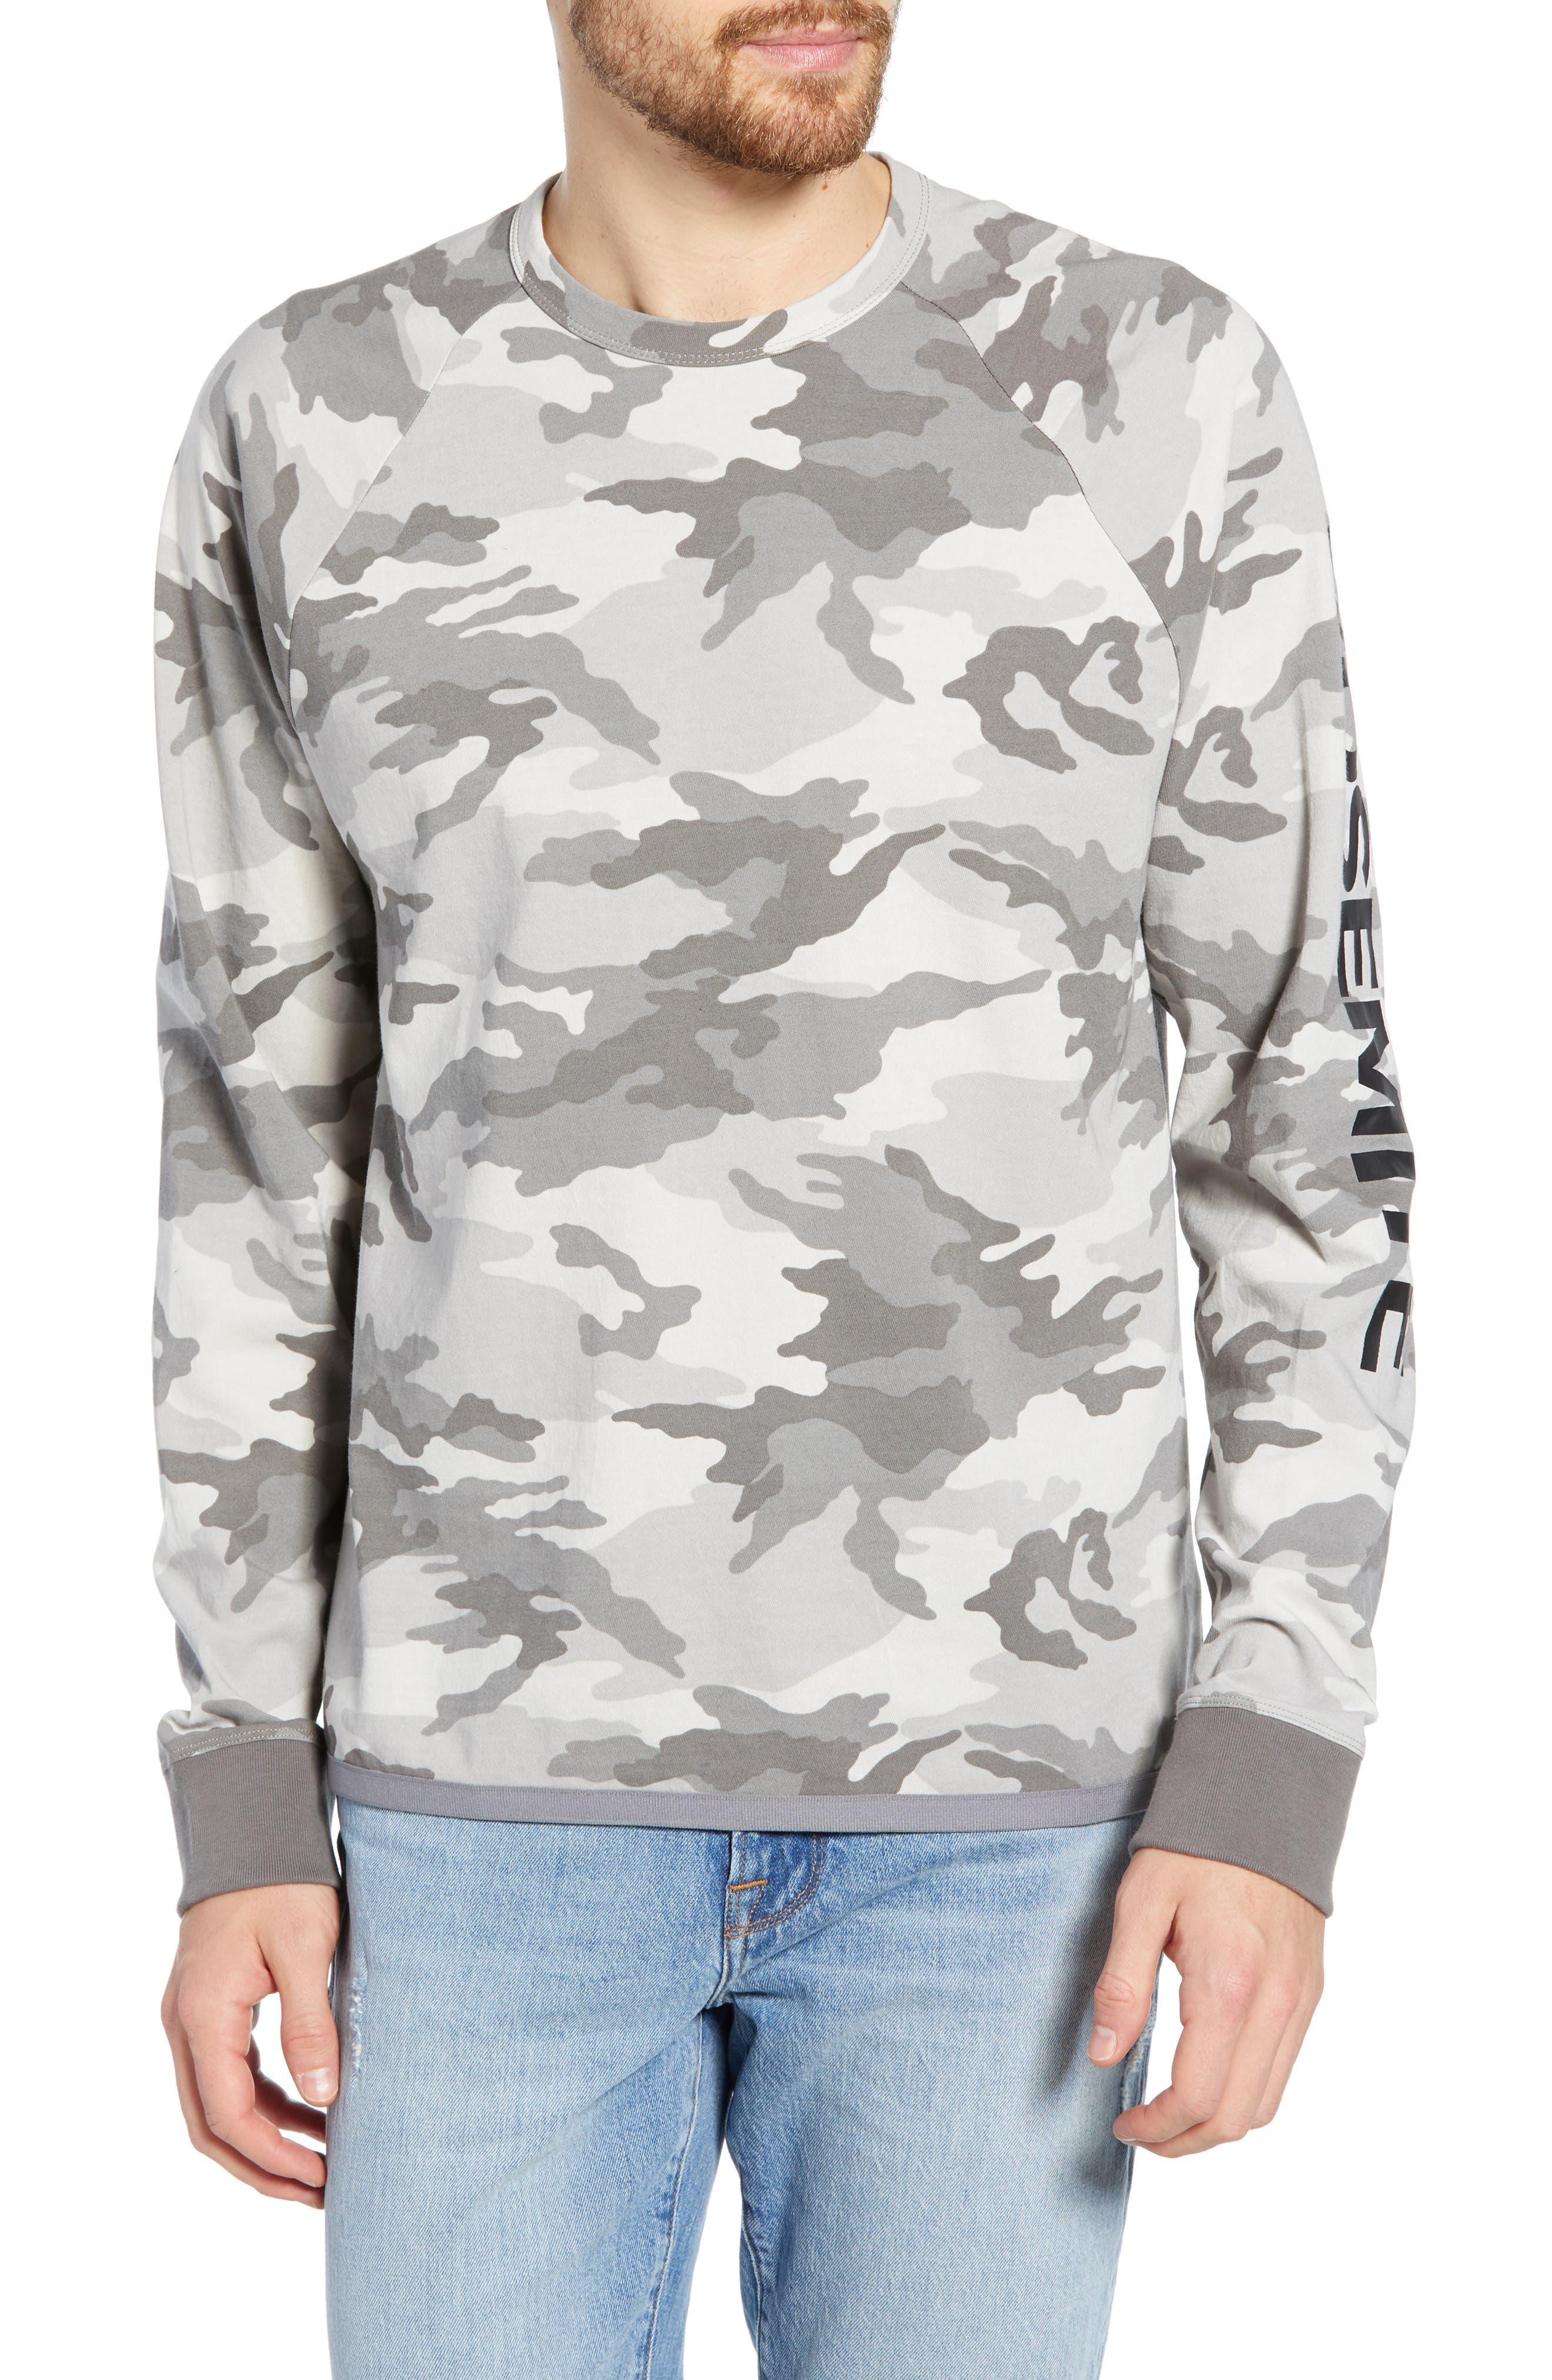 JAMES PERSE Long Sleeve Yosemite Camo Sweatshirt, Main, color, MIST CAMO